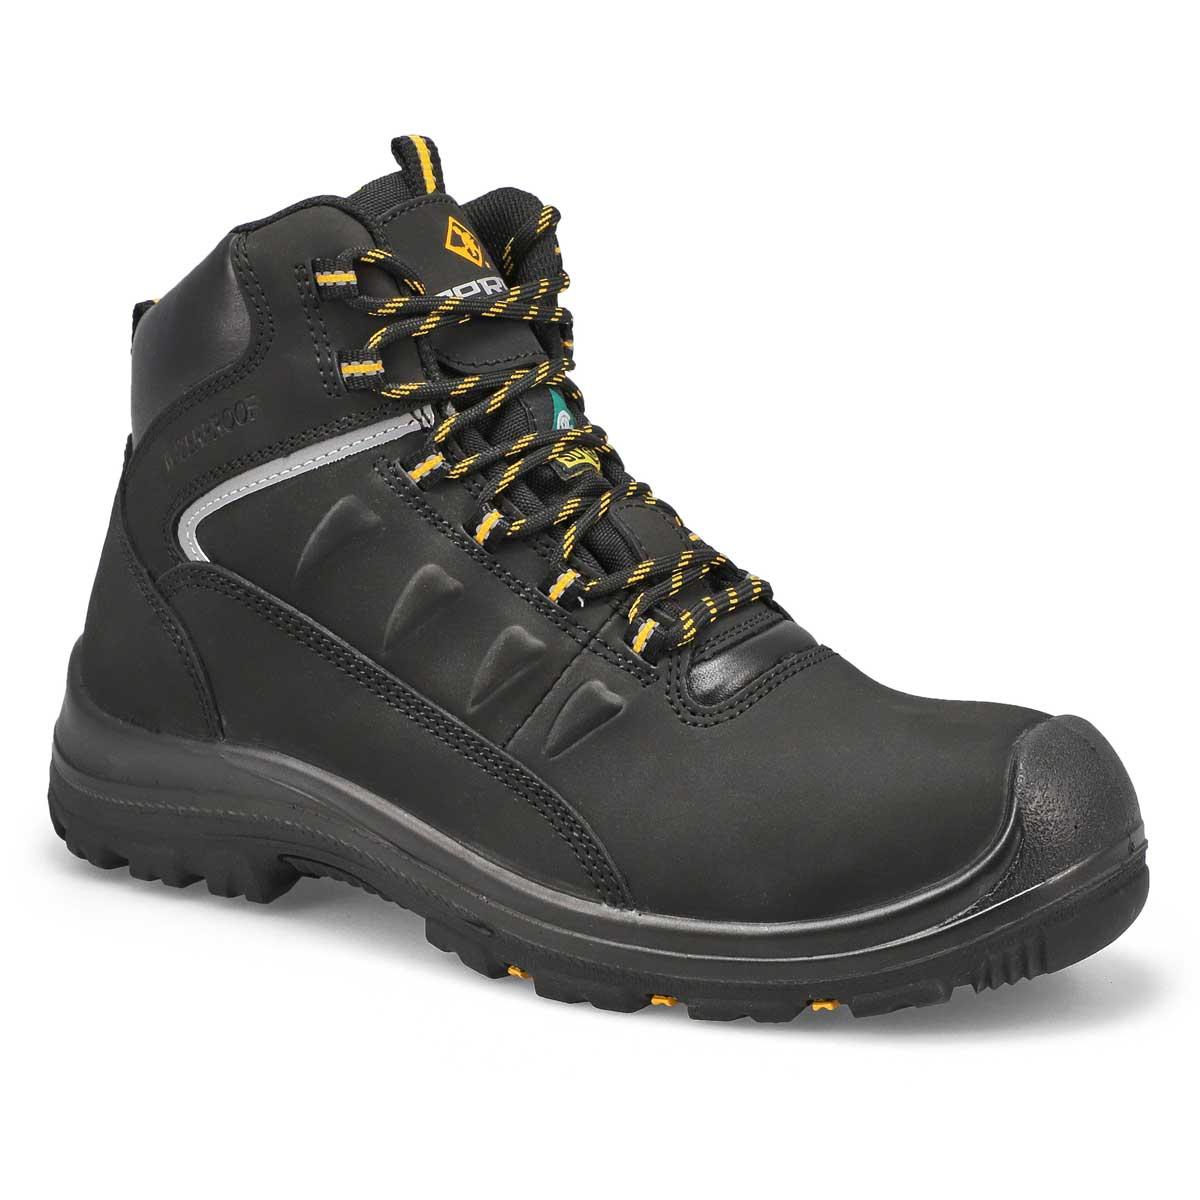 Mns Findlay black lace up CSA boot